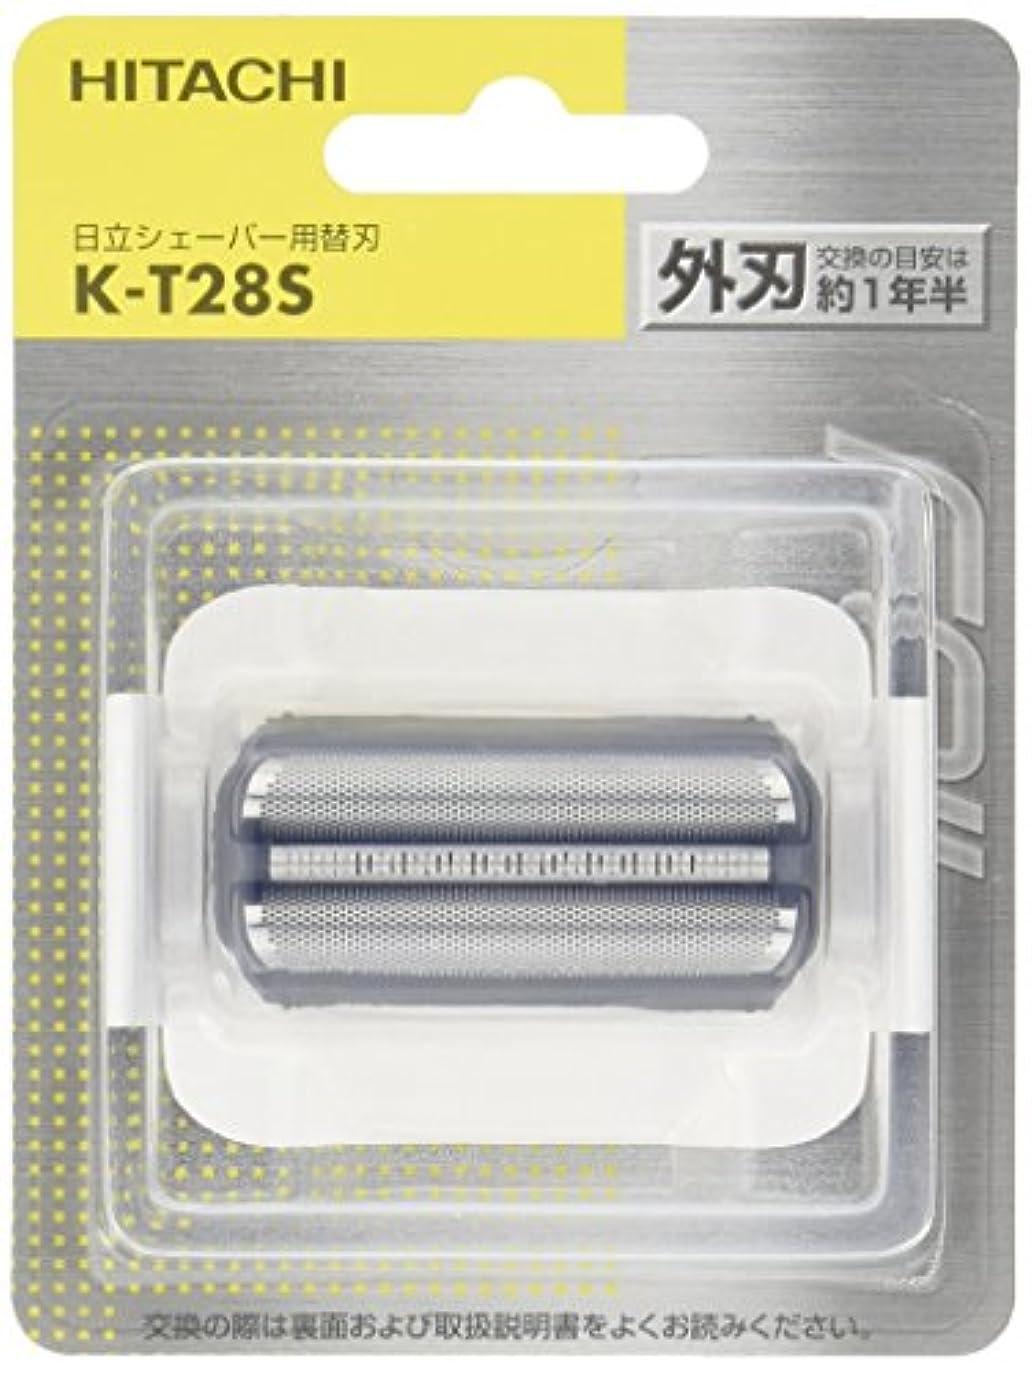 住所シュート海港日立 替刃 外刃 K-T28S